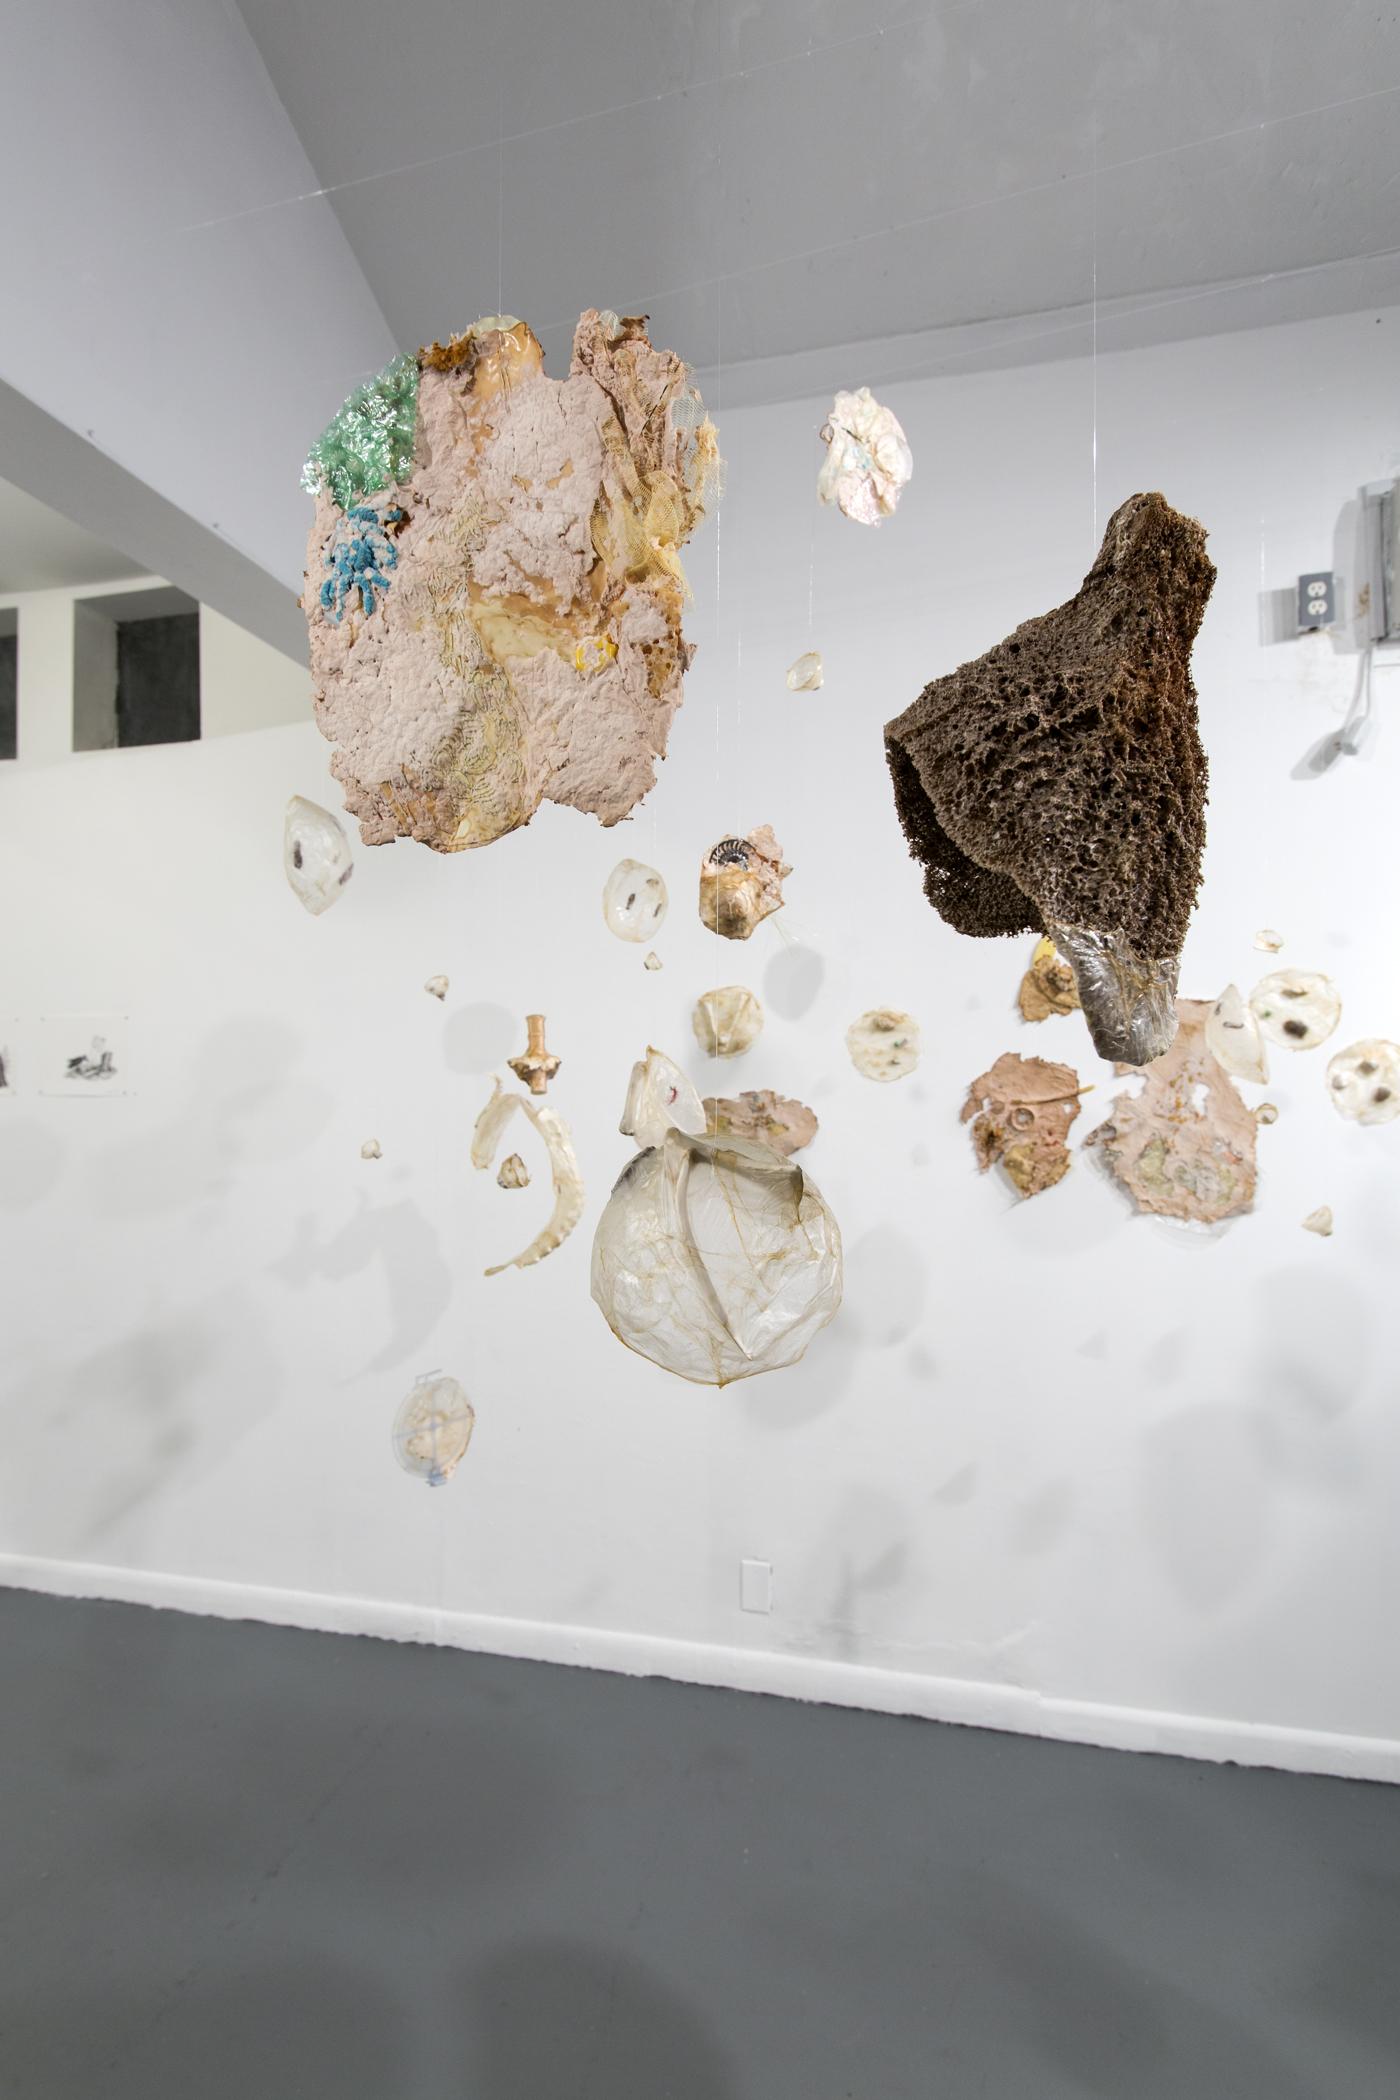 Heather Komus, Absorb, Adapt, 2015, mixed media